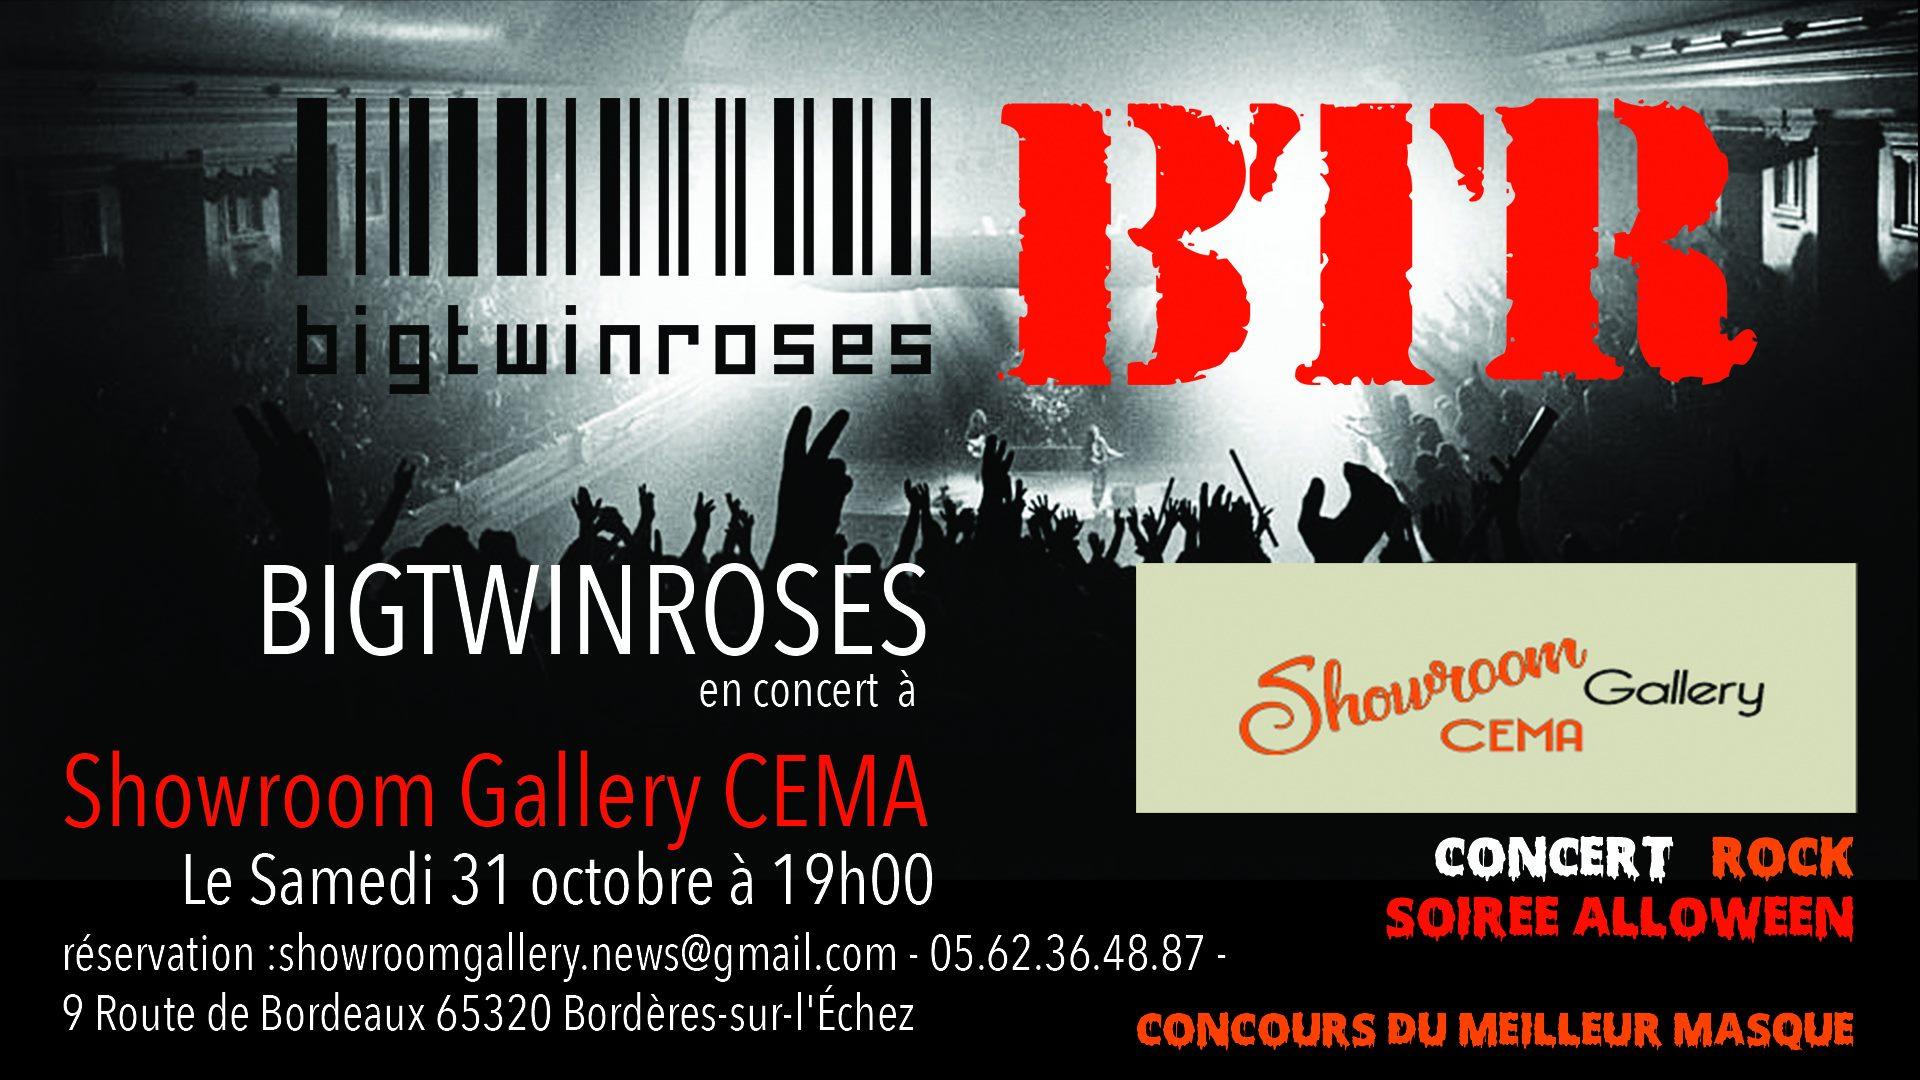 Concert B.T.R BigTwinRoses // Soirée Halloween